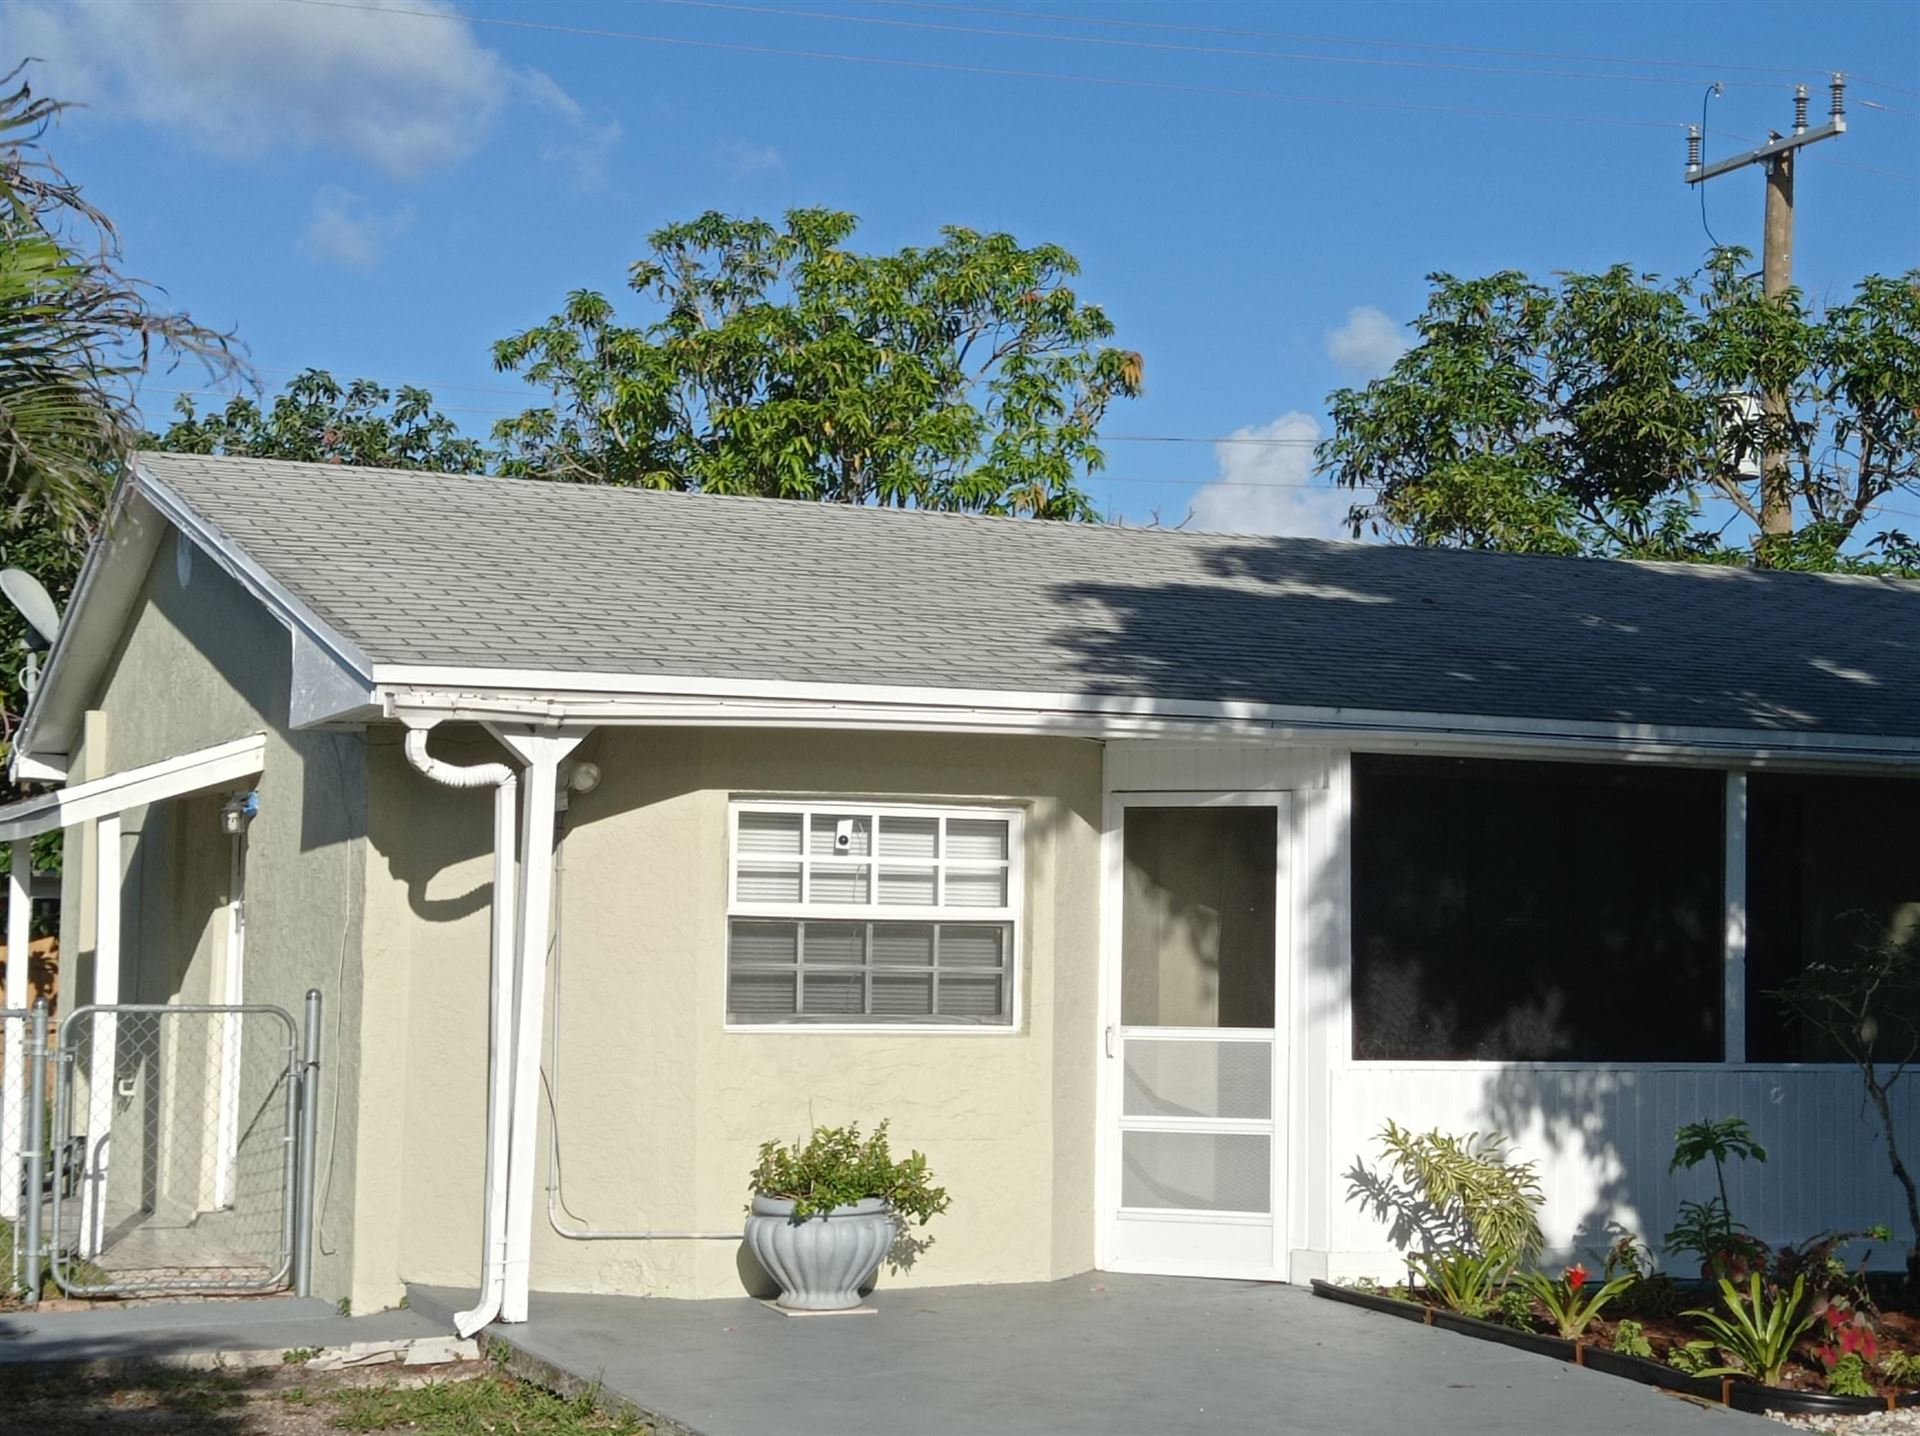 416 NW 7th Court, Boynton Beach, FL 33426 - MLS#: RX-10731827